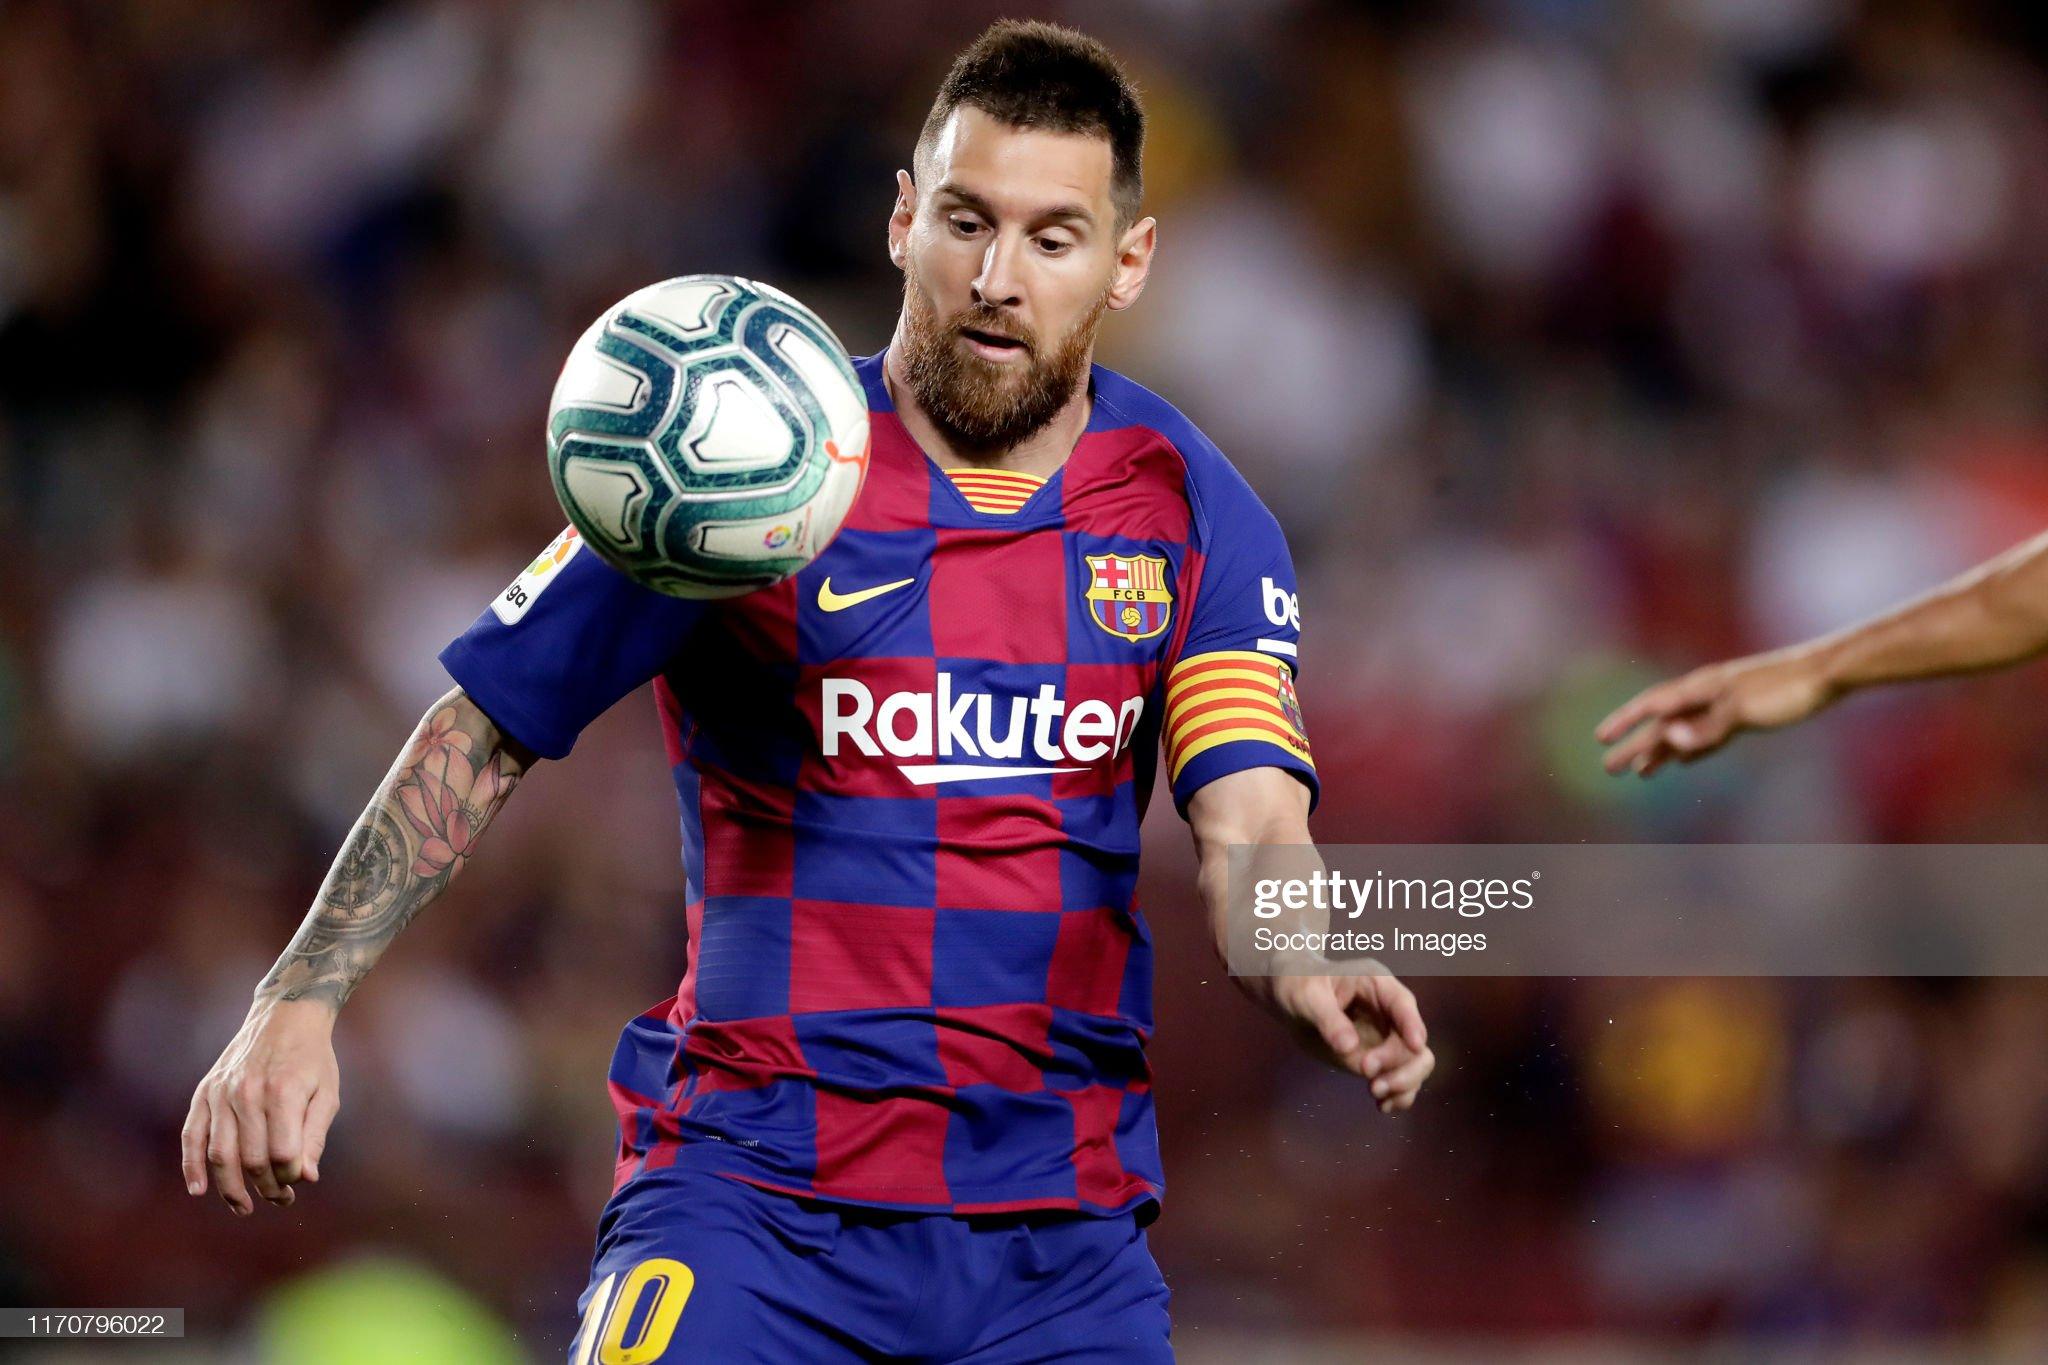 صور مباراة : برشلونة - فياريال 2-1 ( 24-09-2019 )  Lionel-messi-of-fc-barcelona-during-the-la-liga-santander-match-fc-picture-id1170796022?s=2048x2048